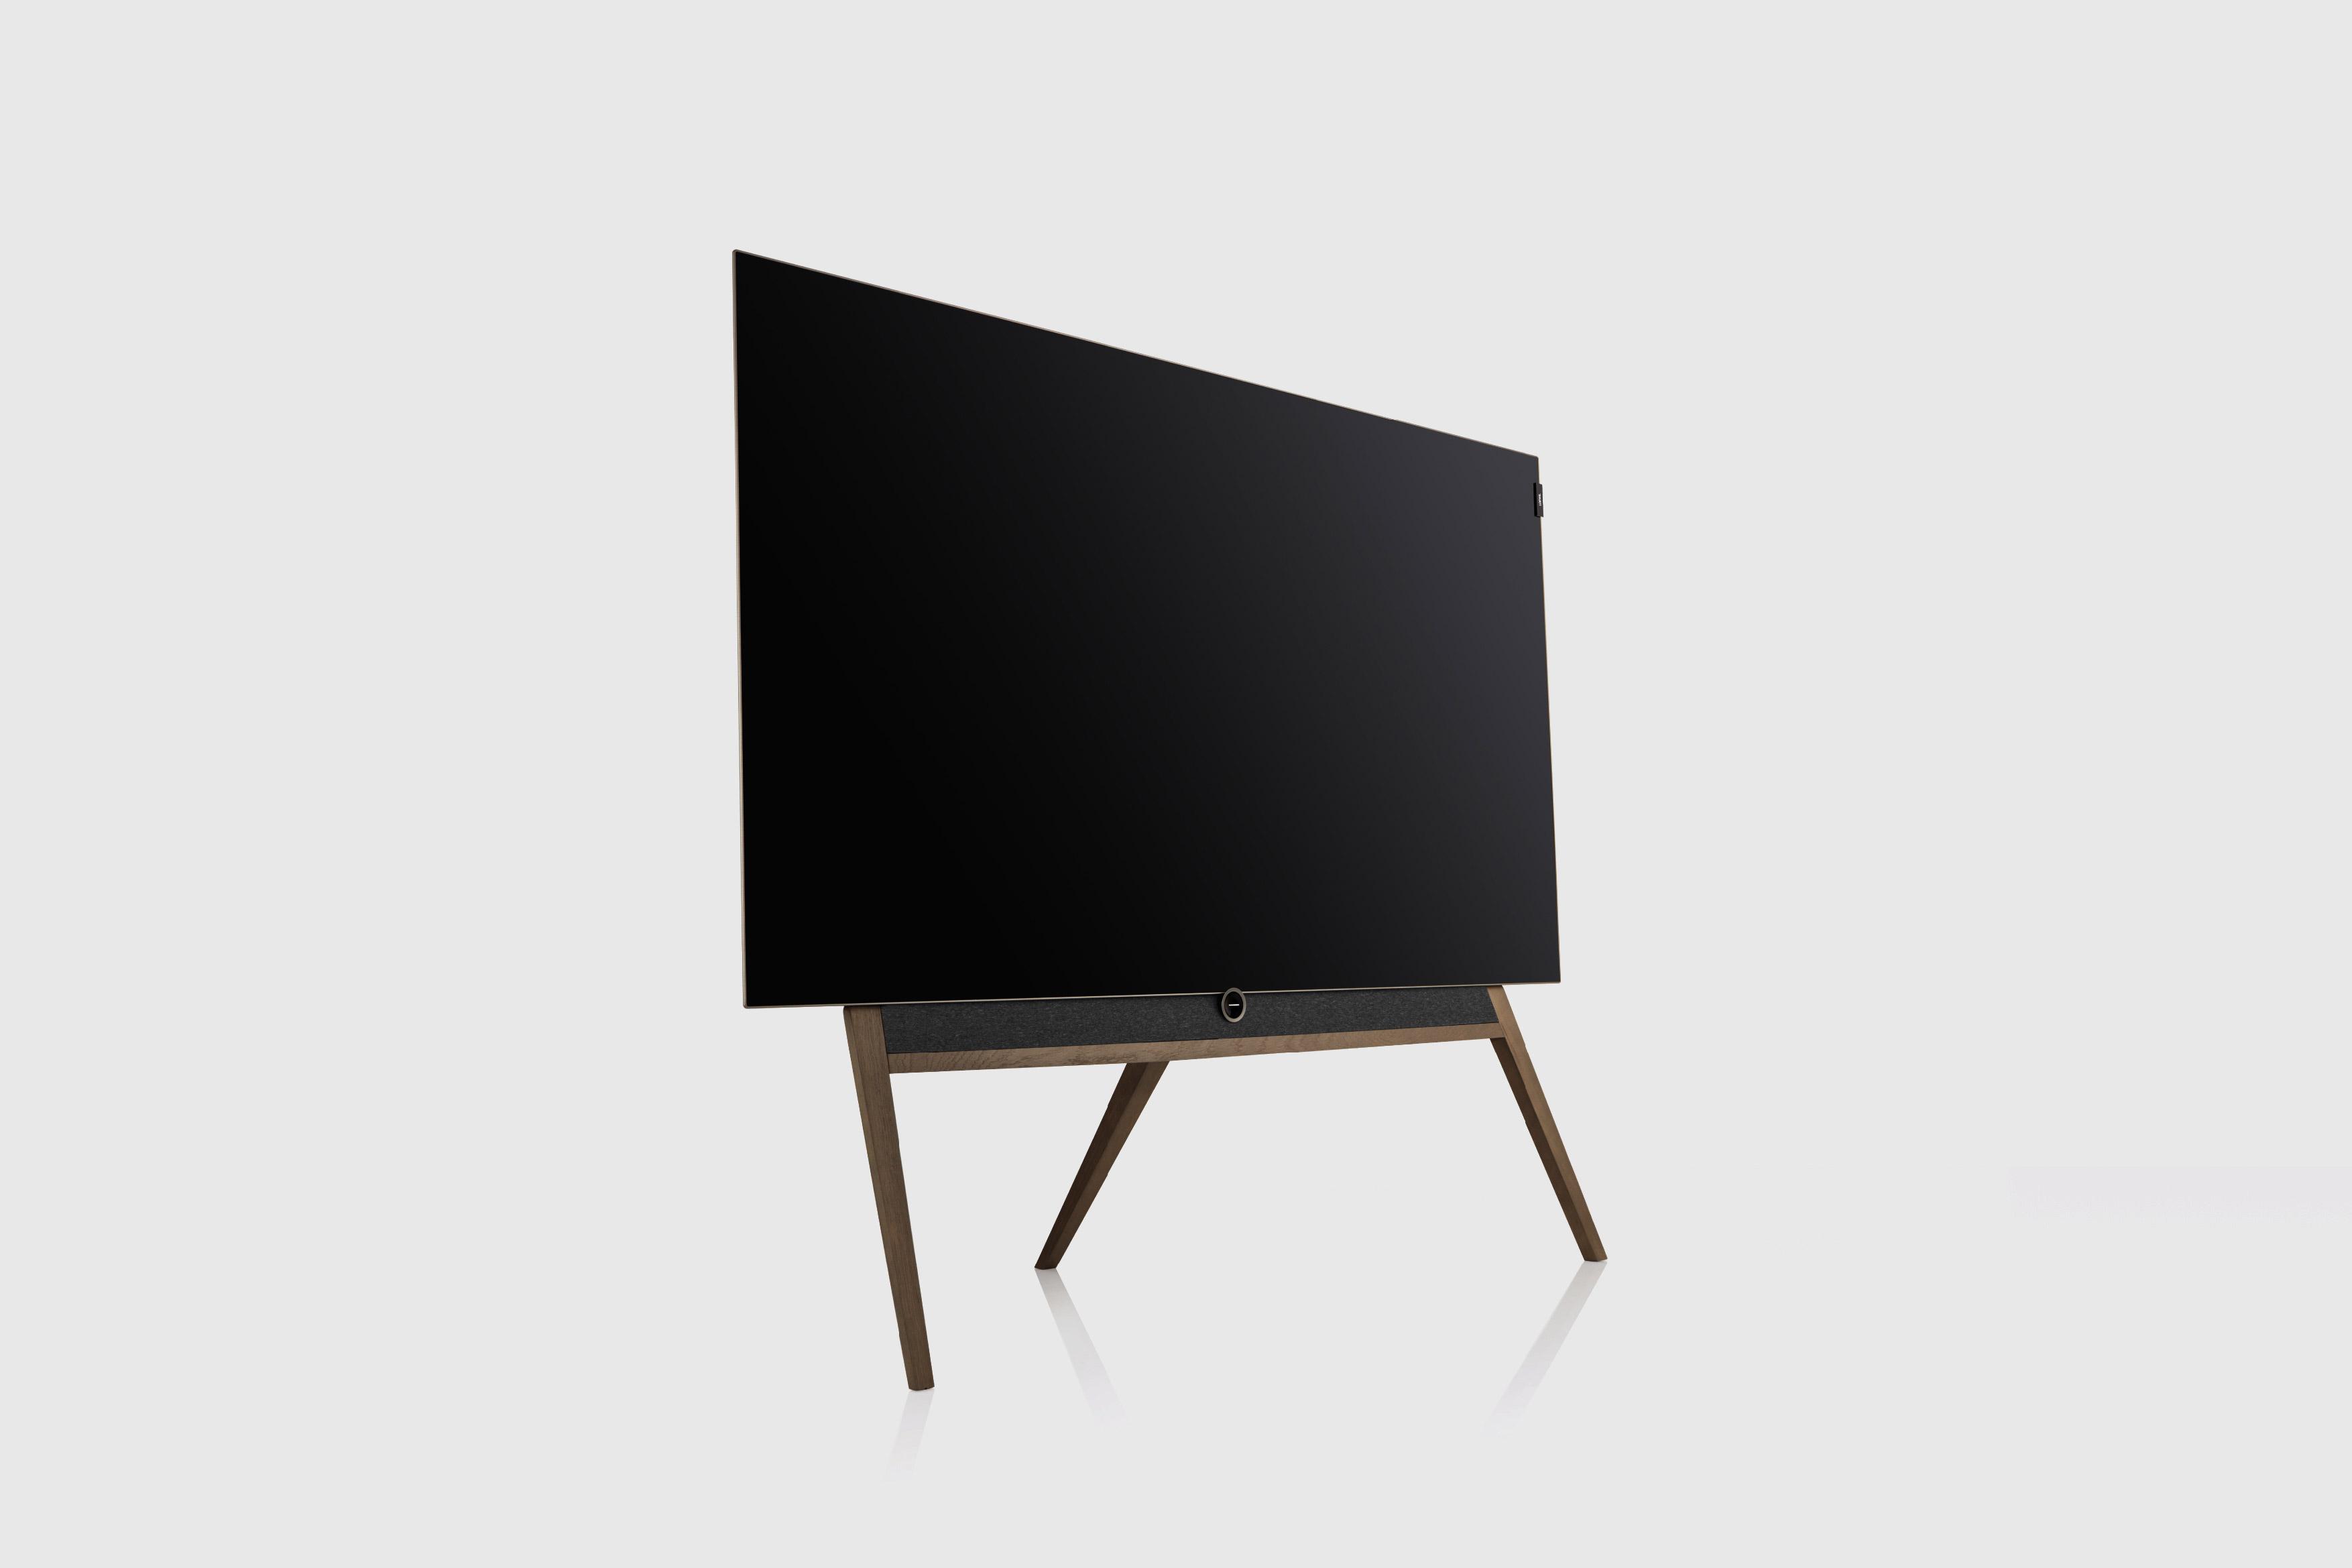 Loewe bild 5 OLED Television Floorstanding Silver Oak